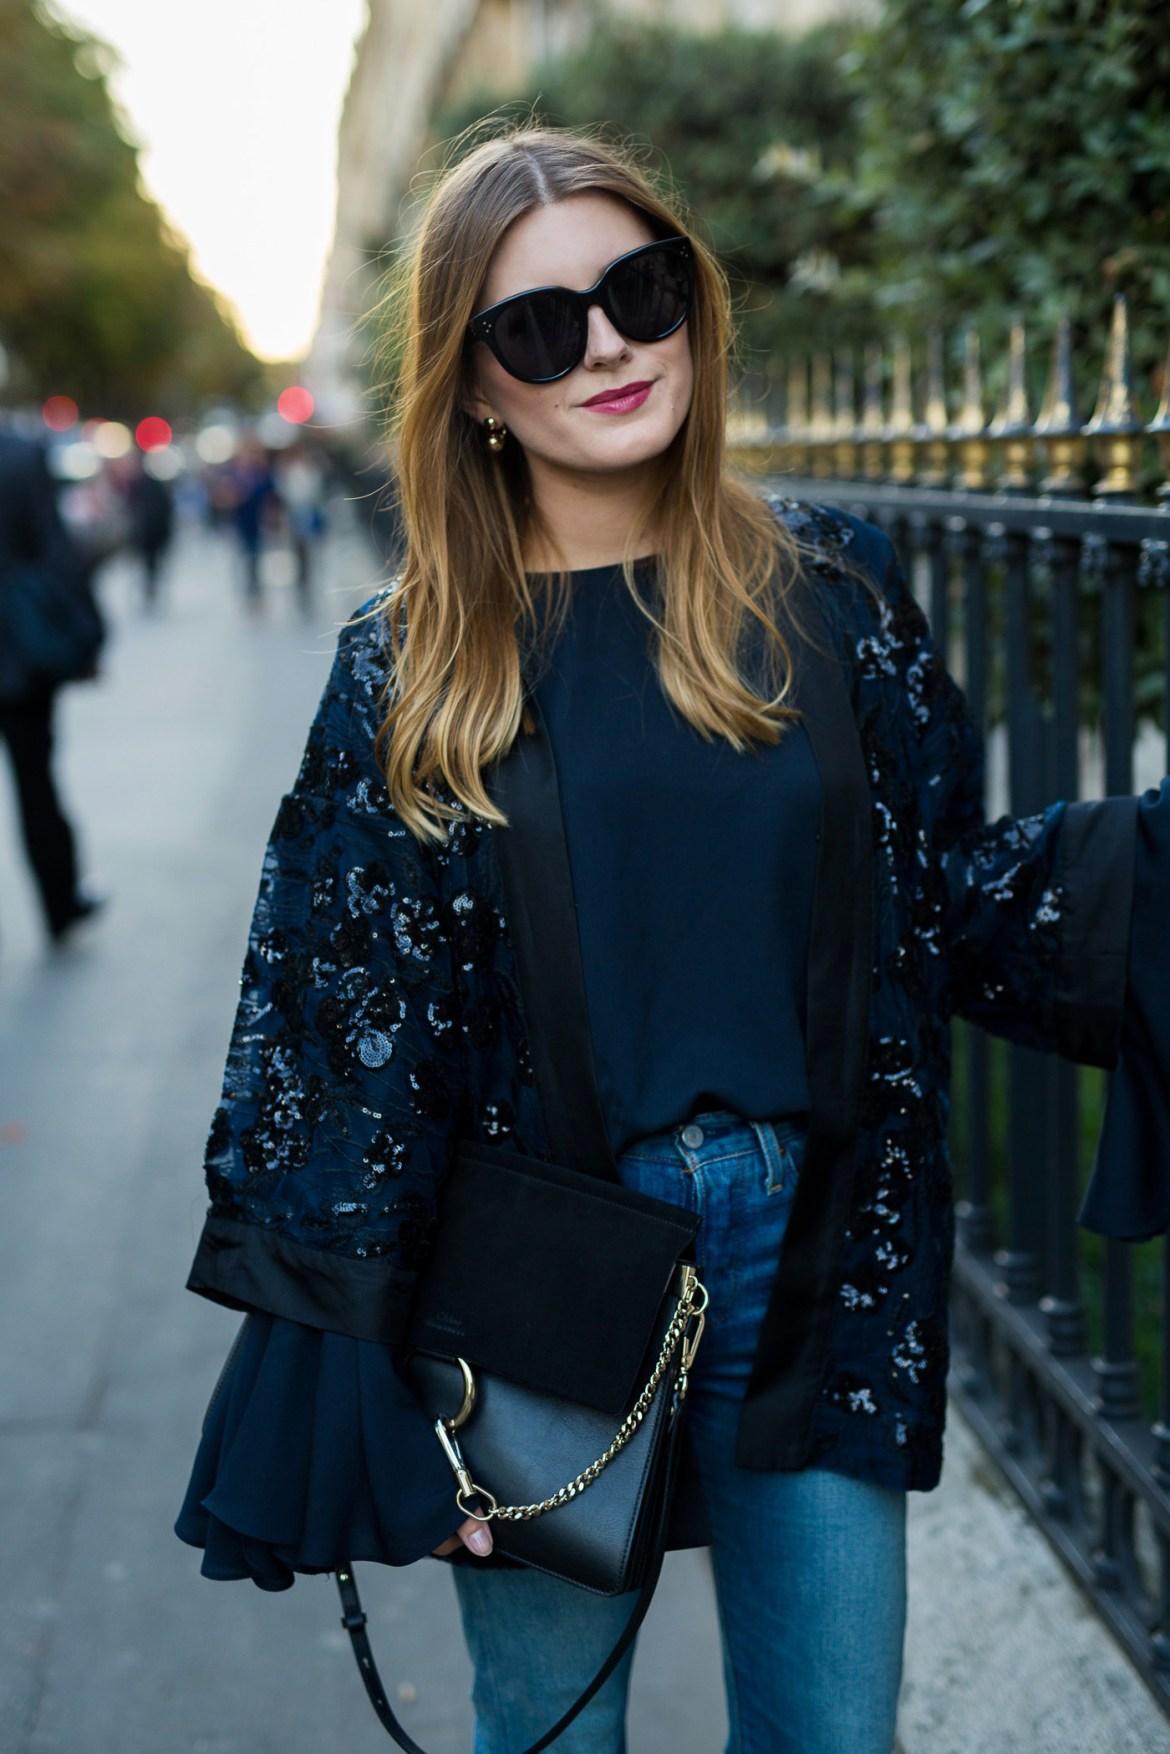 paris_fashion_week_kimono_and_bell_sleeves_6